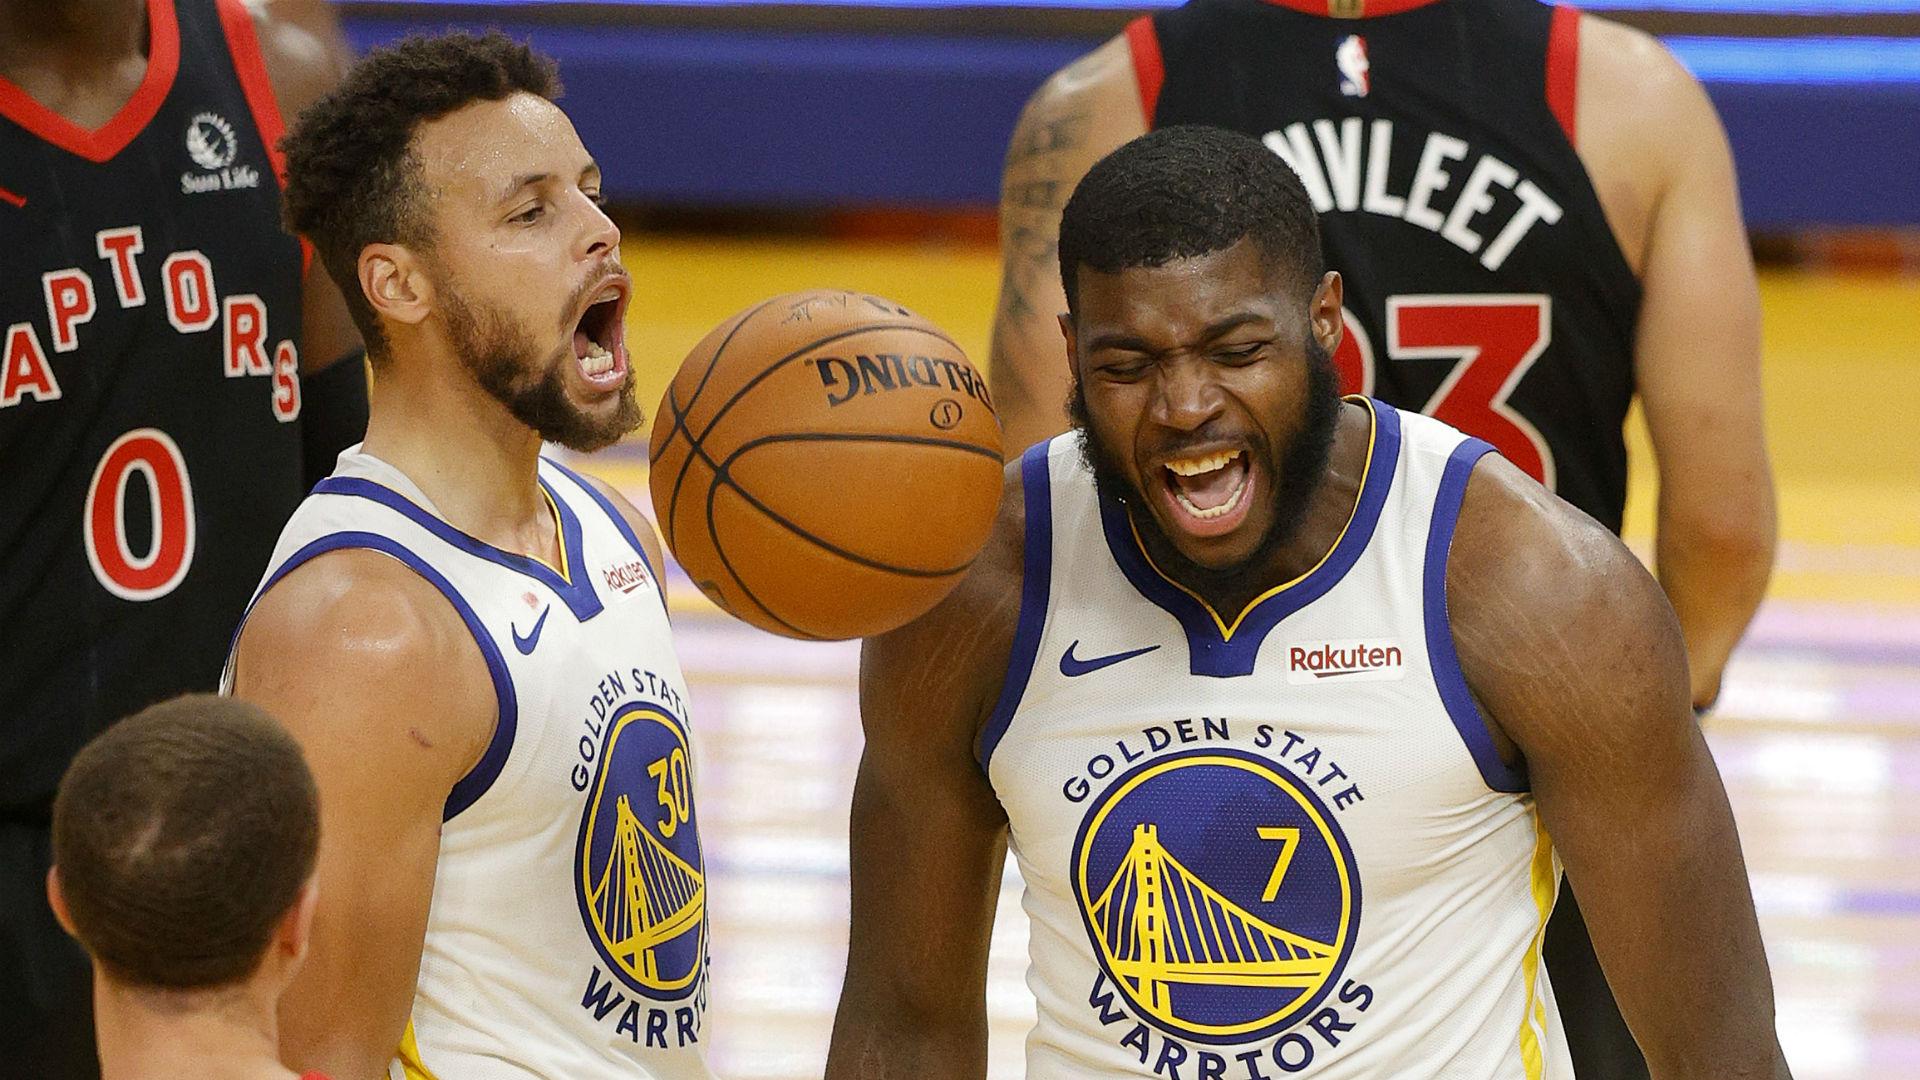 Toronto Raptors vs. Golden State Warriors: Live score, updates, news, stats and highlights | NBA ...